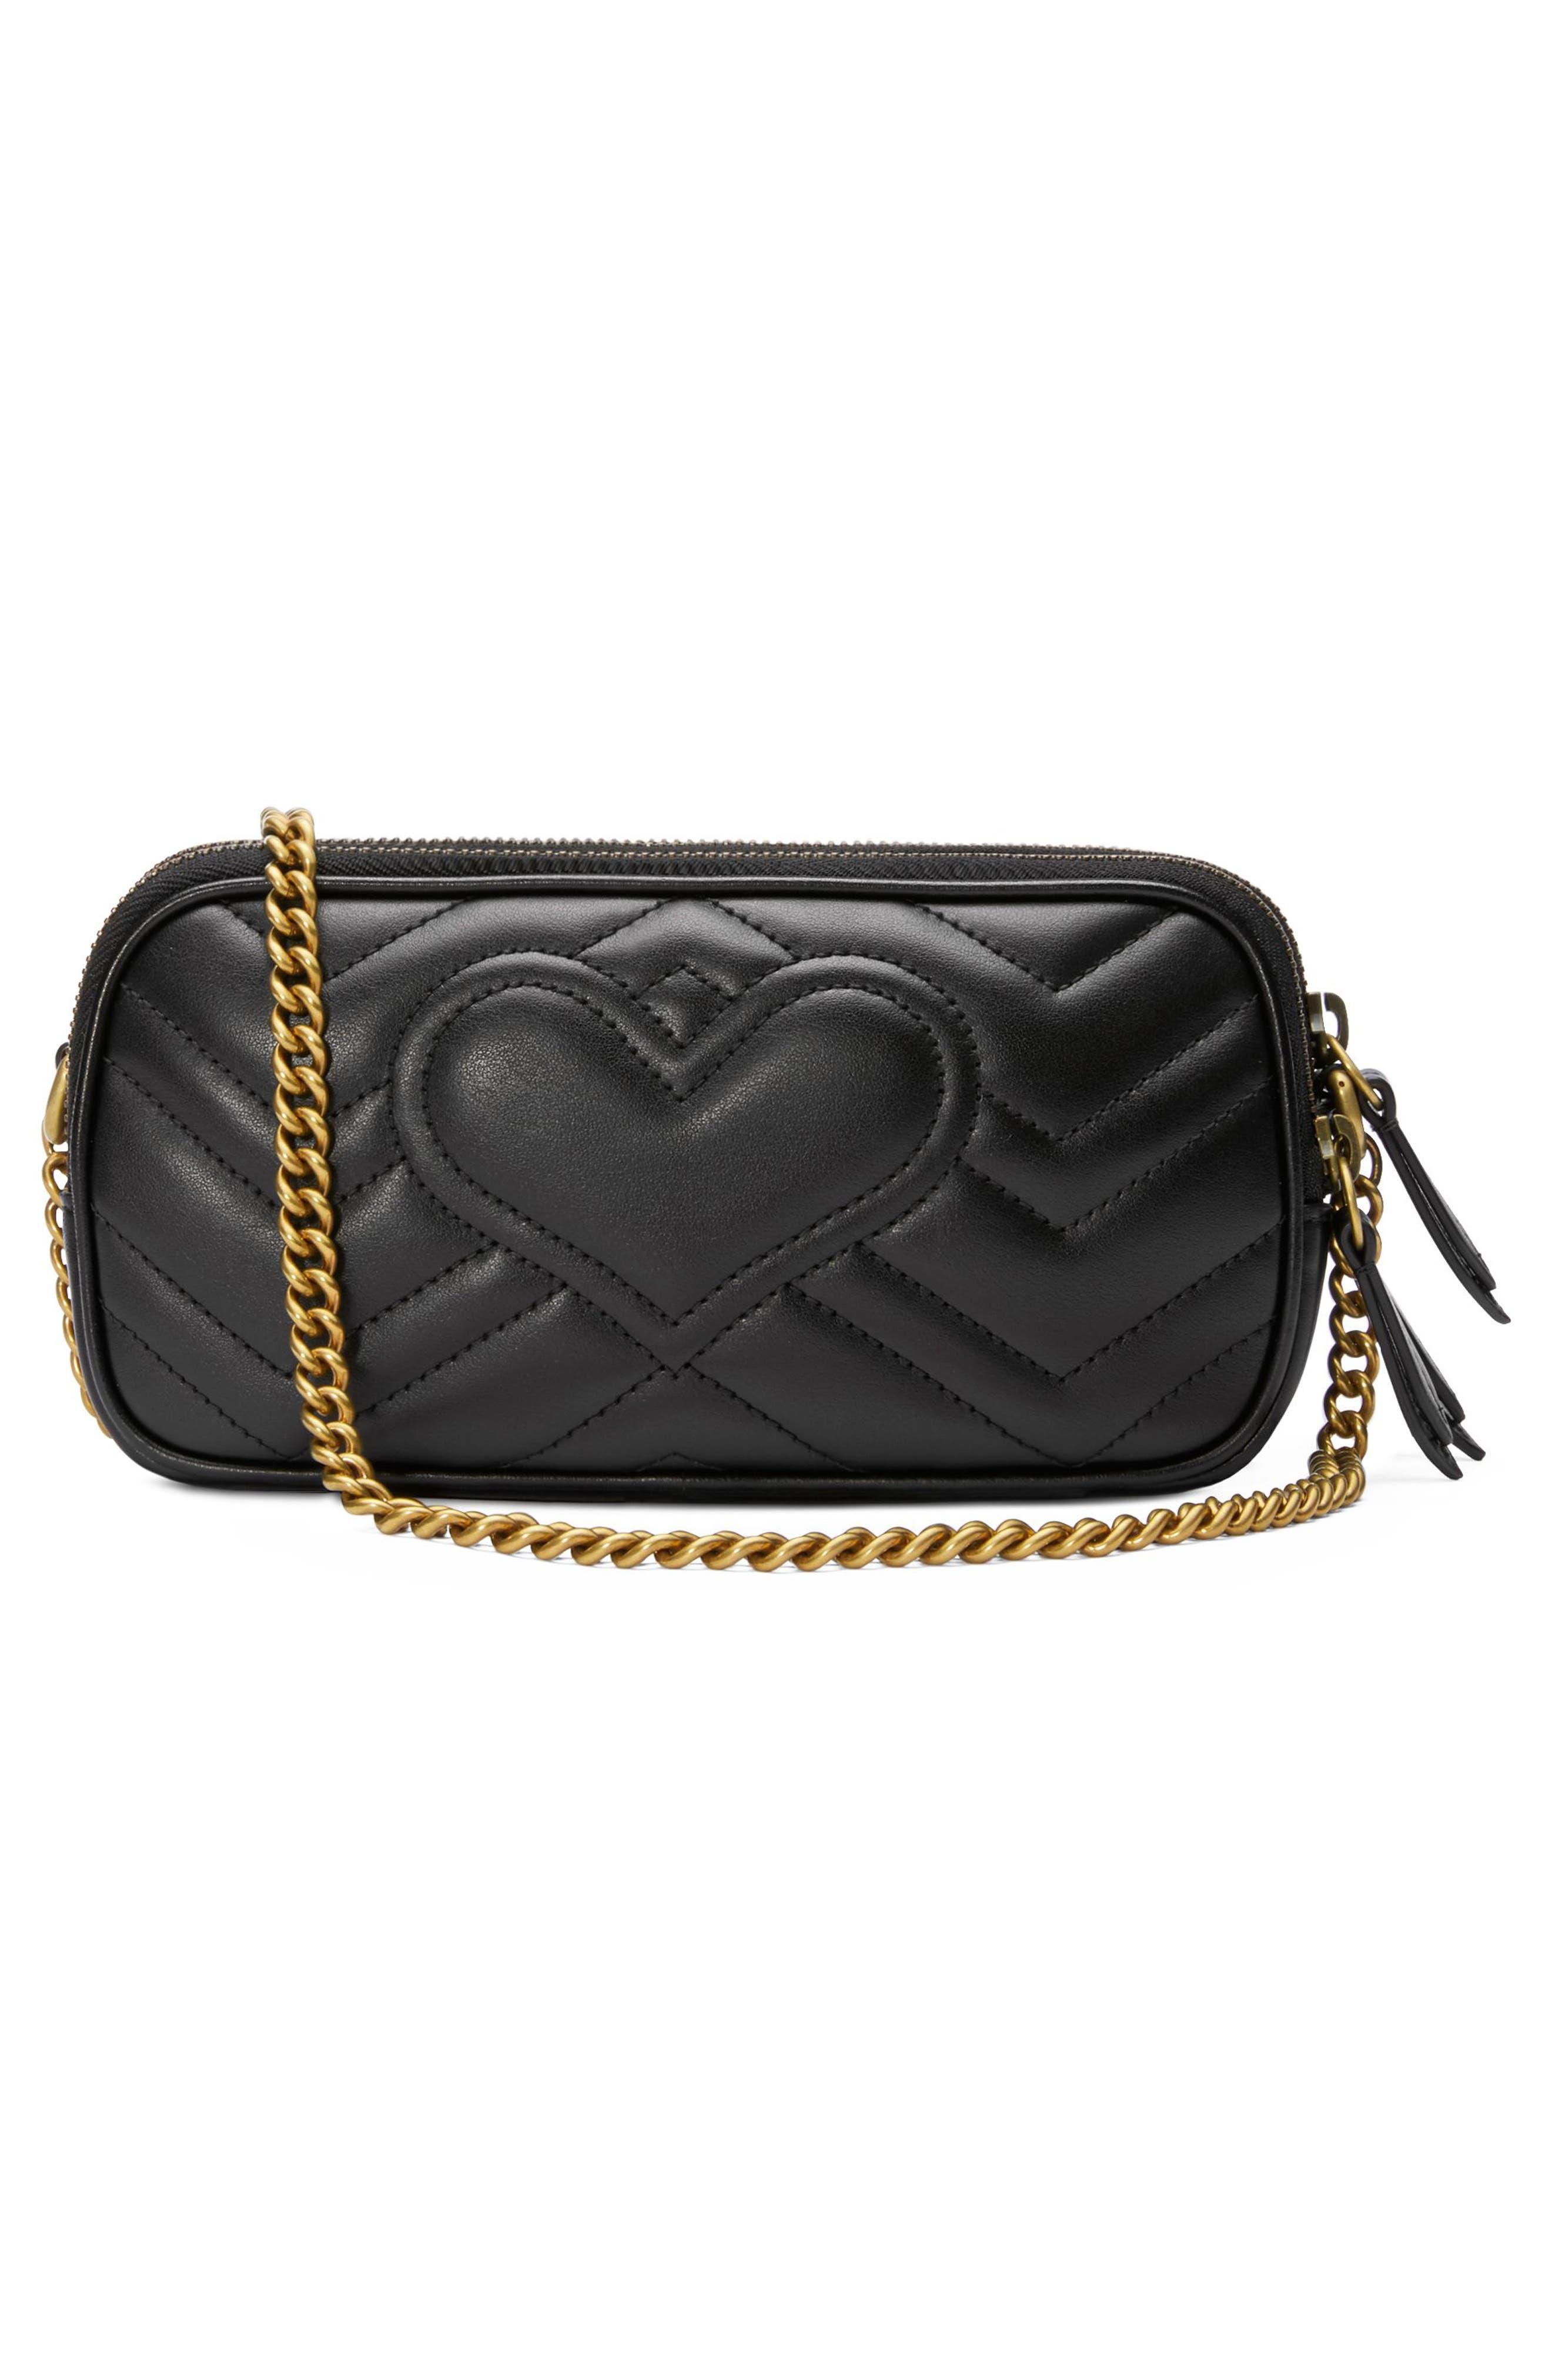 Marmont 2.0 Leather Crossbody Bag,                             Alternate thumbnail 2, color,                             NERO